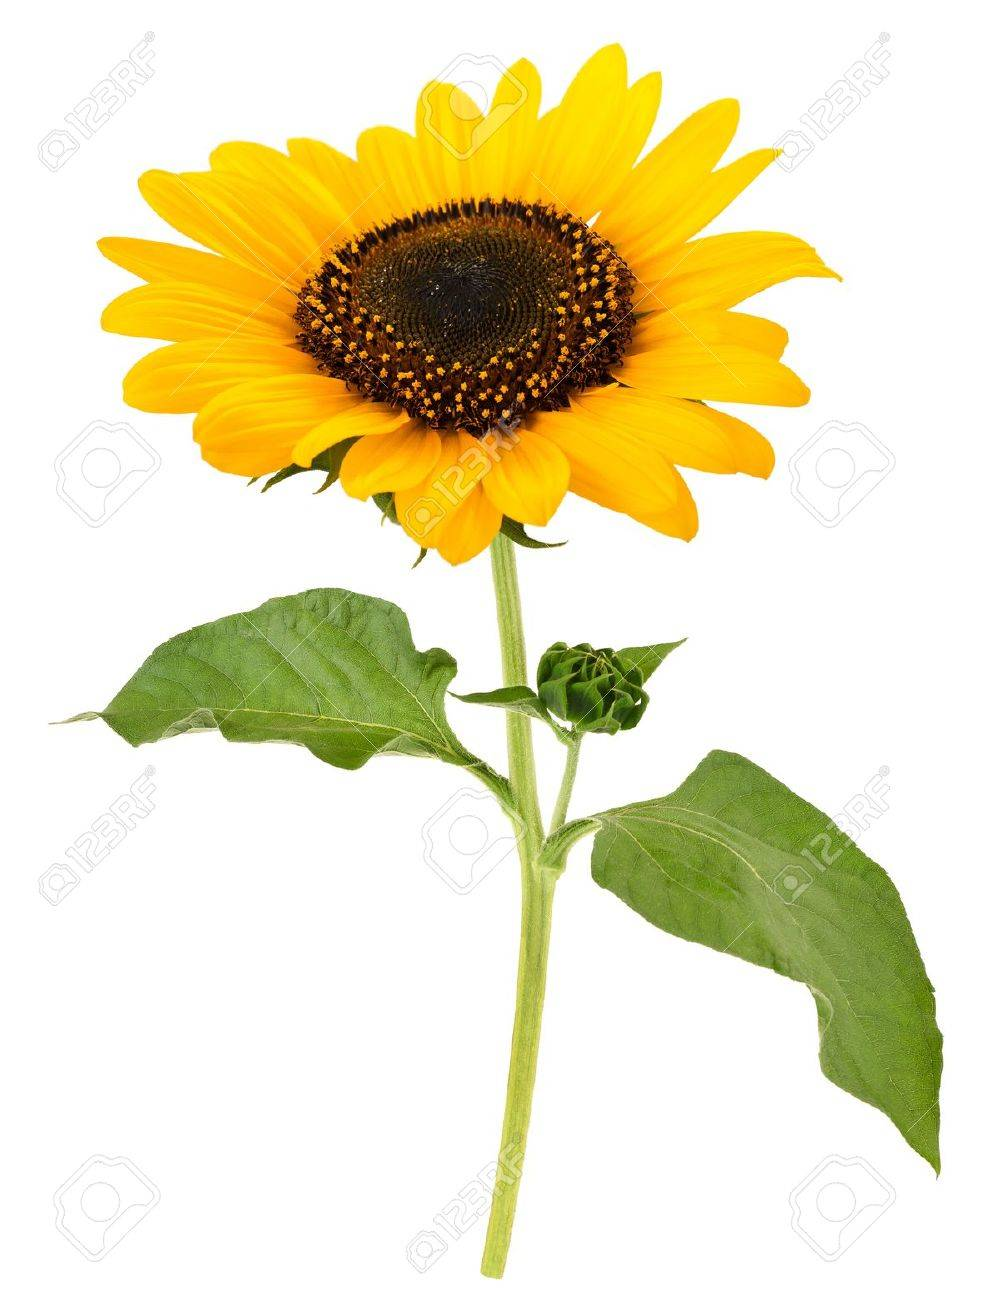 sunflower Stock Photo - 21829972